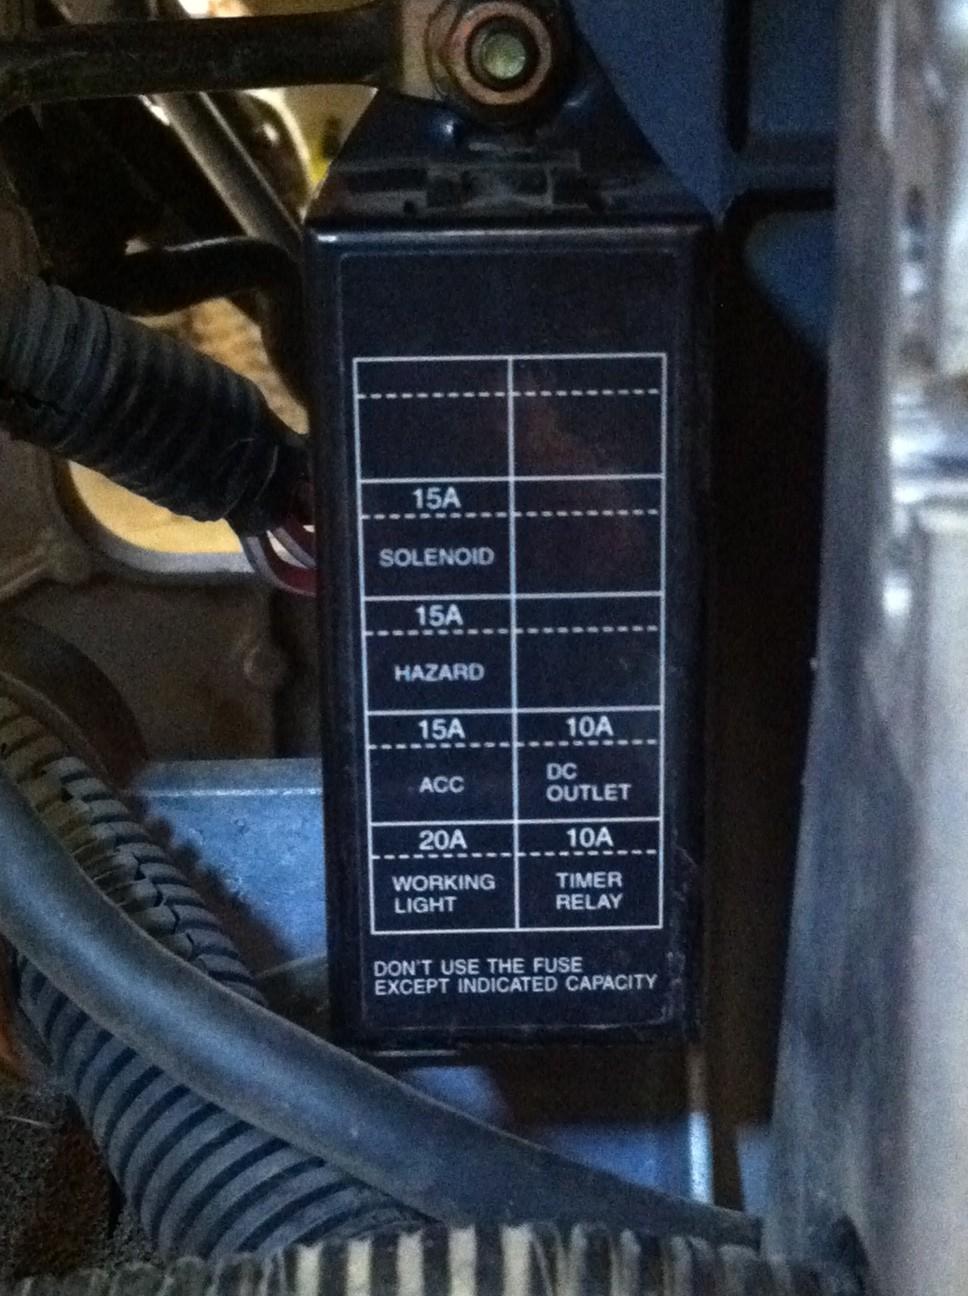 [DIAGRAM_38YU]  AM_3214] Kubota Work Light Wiring Diagram Schematic Wiring | Kubota Rtv 1100 Fuse Box |  | Ratag Xeira Mohammedshrine Librar Wiring 101